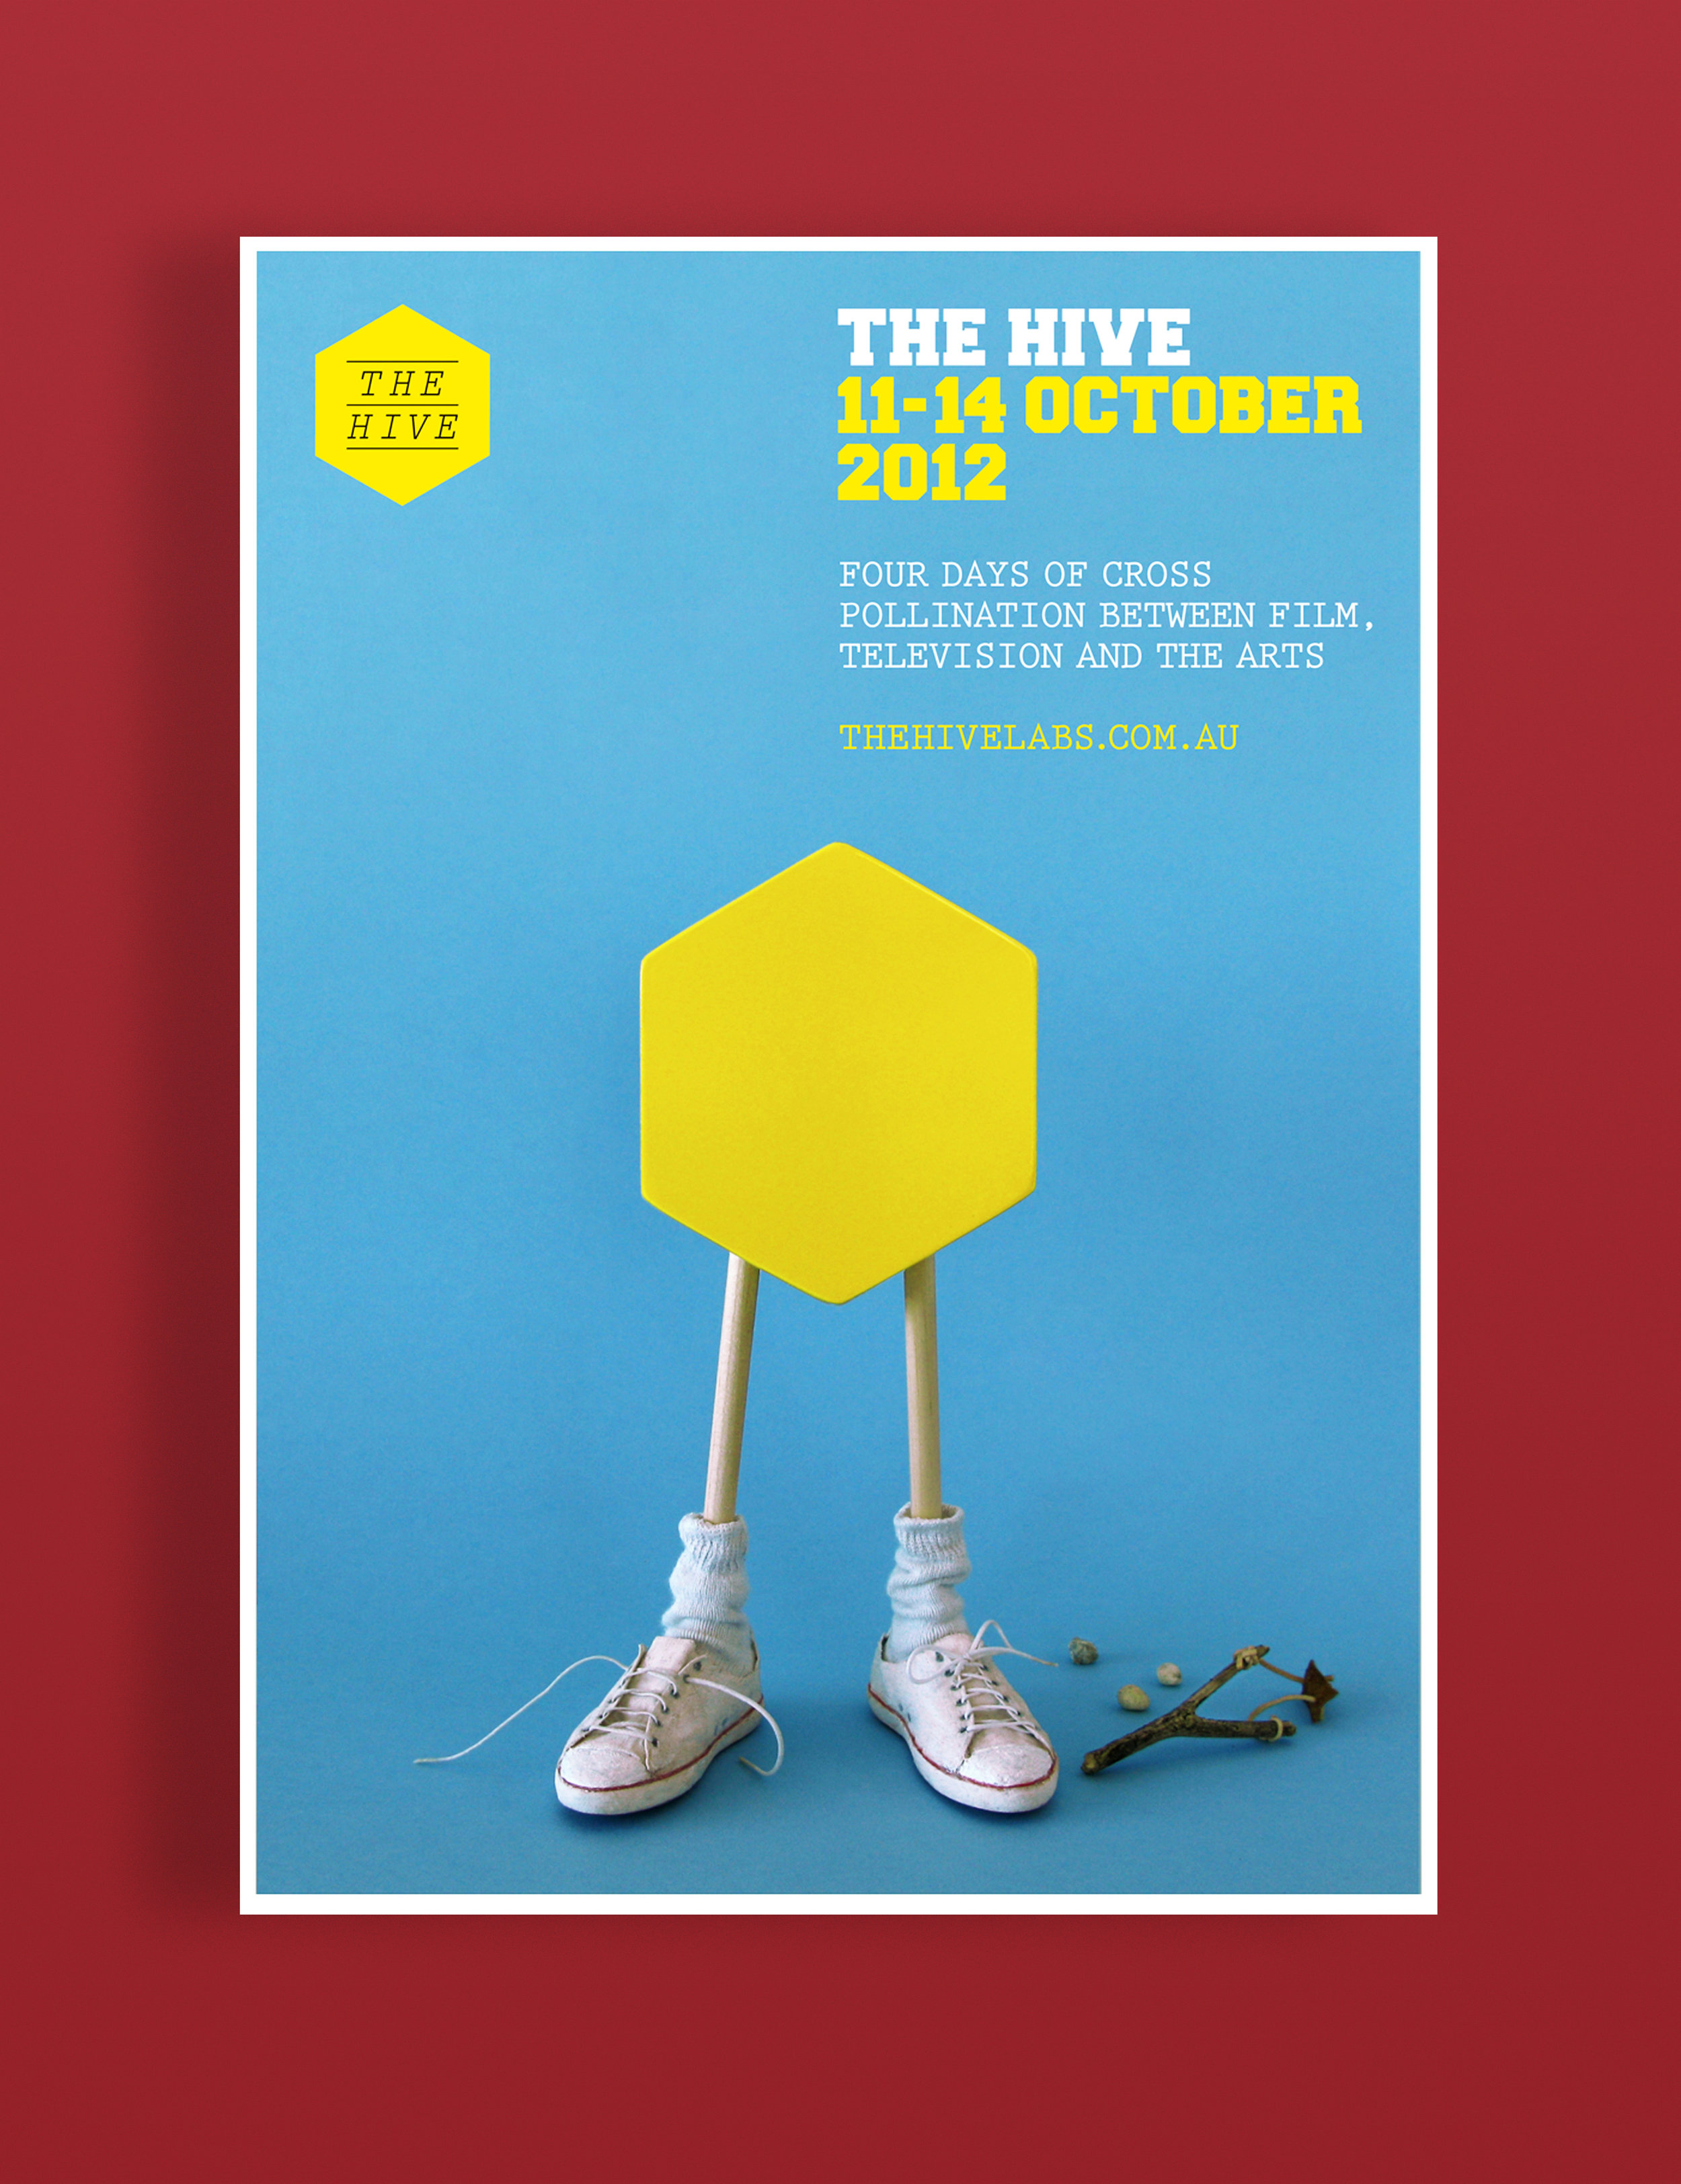 HSITI_The_Hive_Poster_01.jpg